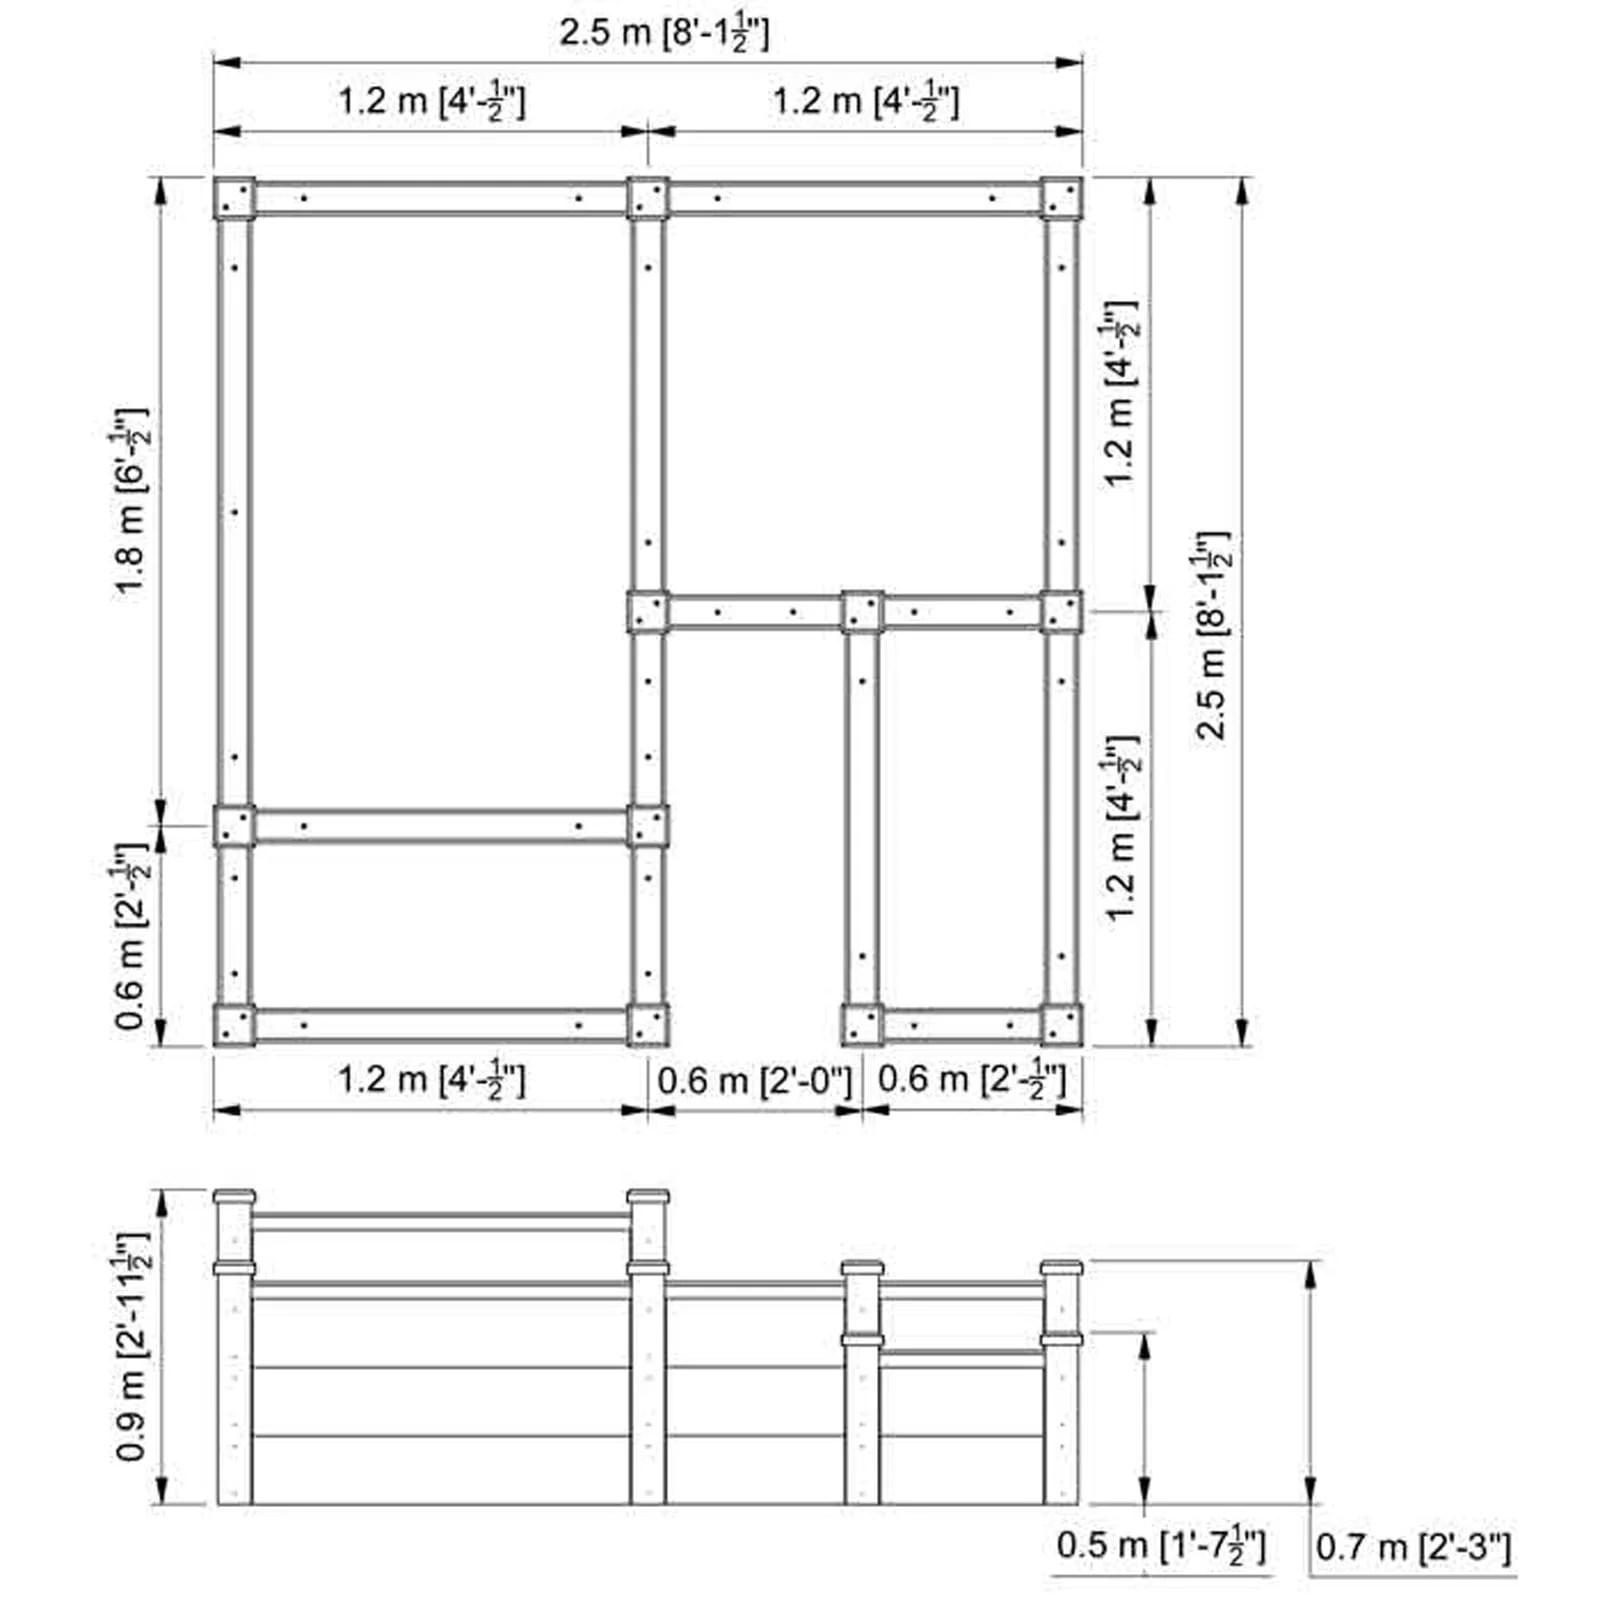 hight resolution of superior raised beds multi tier bespoke design enlarge superior